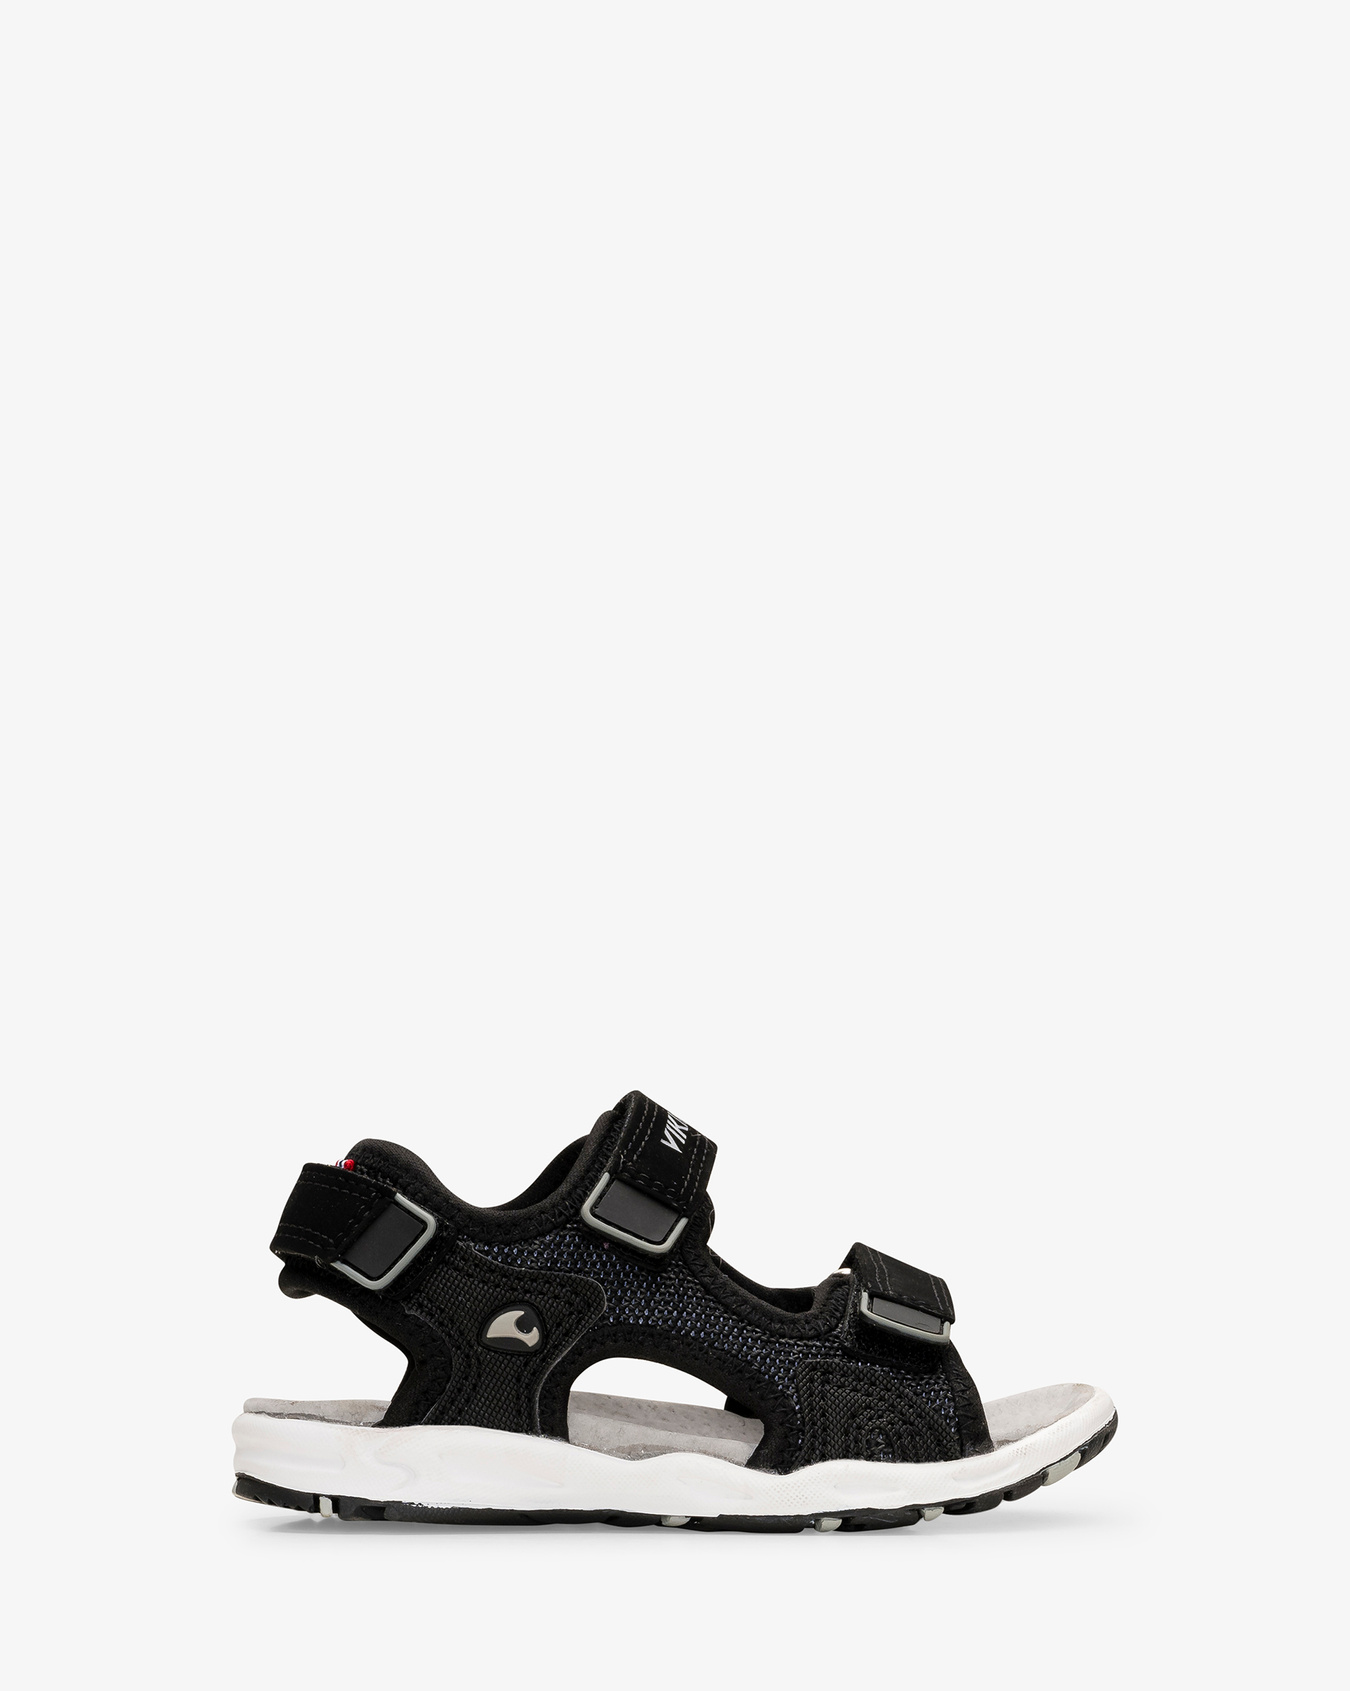 Anchor Sandal